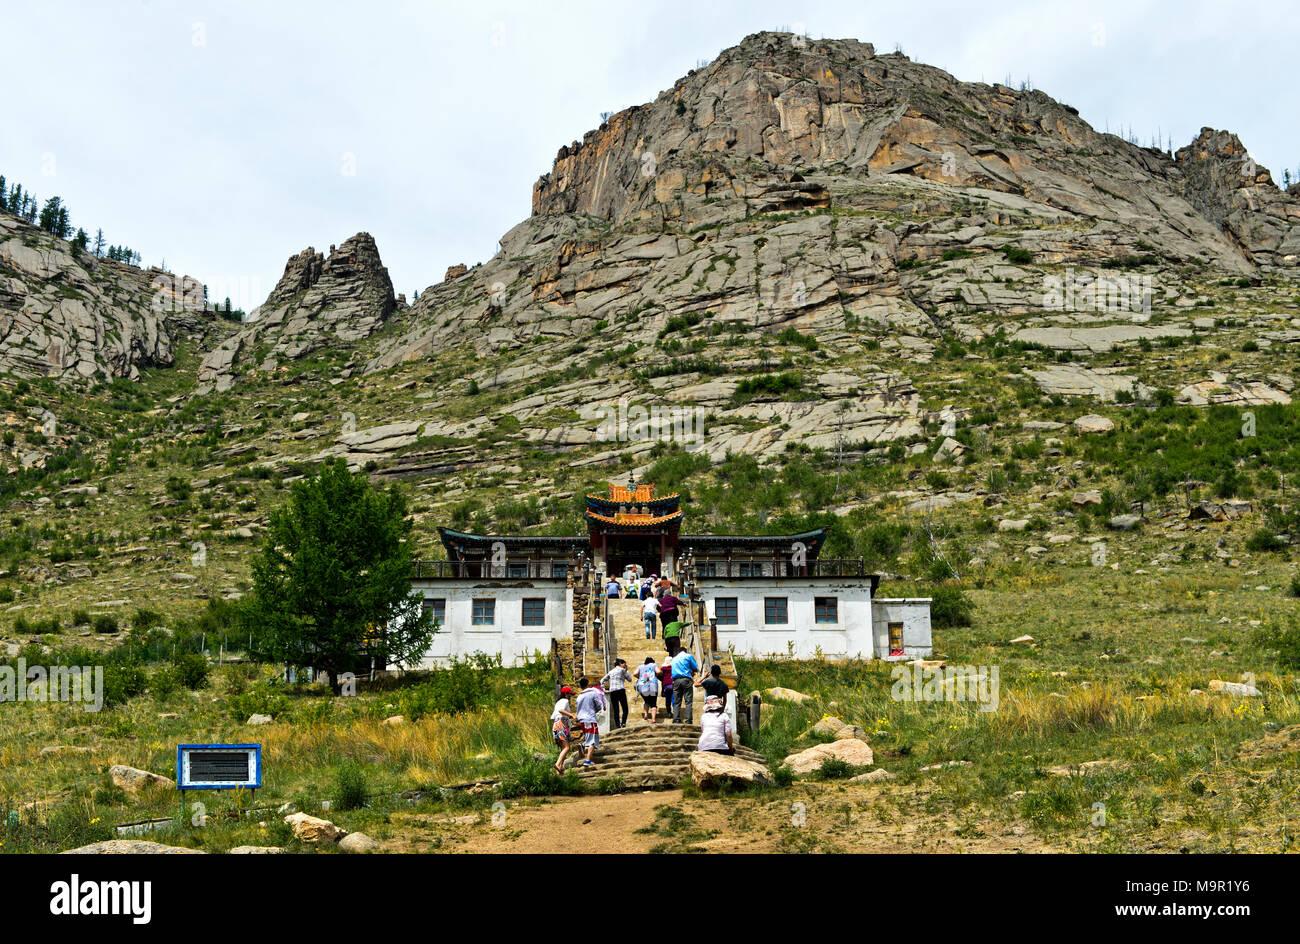 Buddhist Monastery Aryapala Initiation and Meditation Centre, Gorchi-Terelj National Park, Terelj, Mongolia - Stock Image